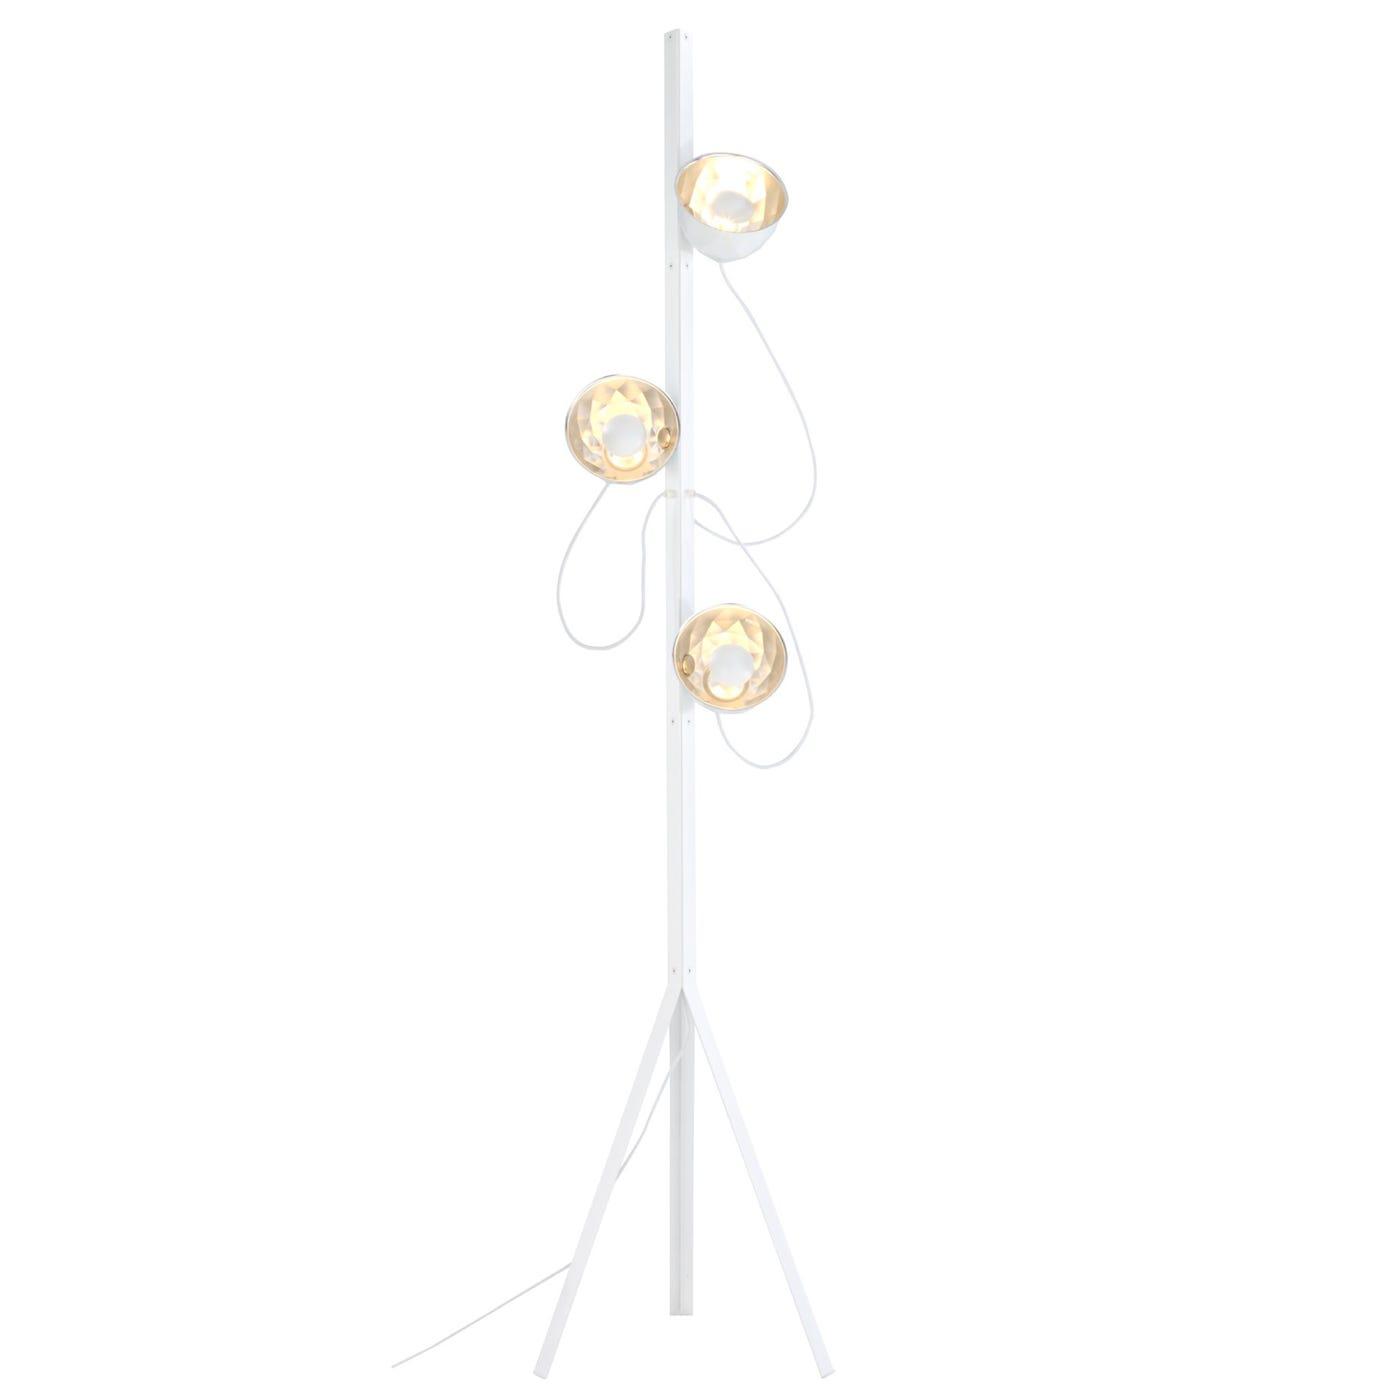 Trepied Floor Lamp White